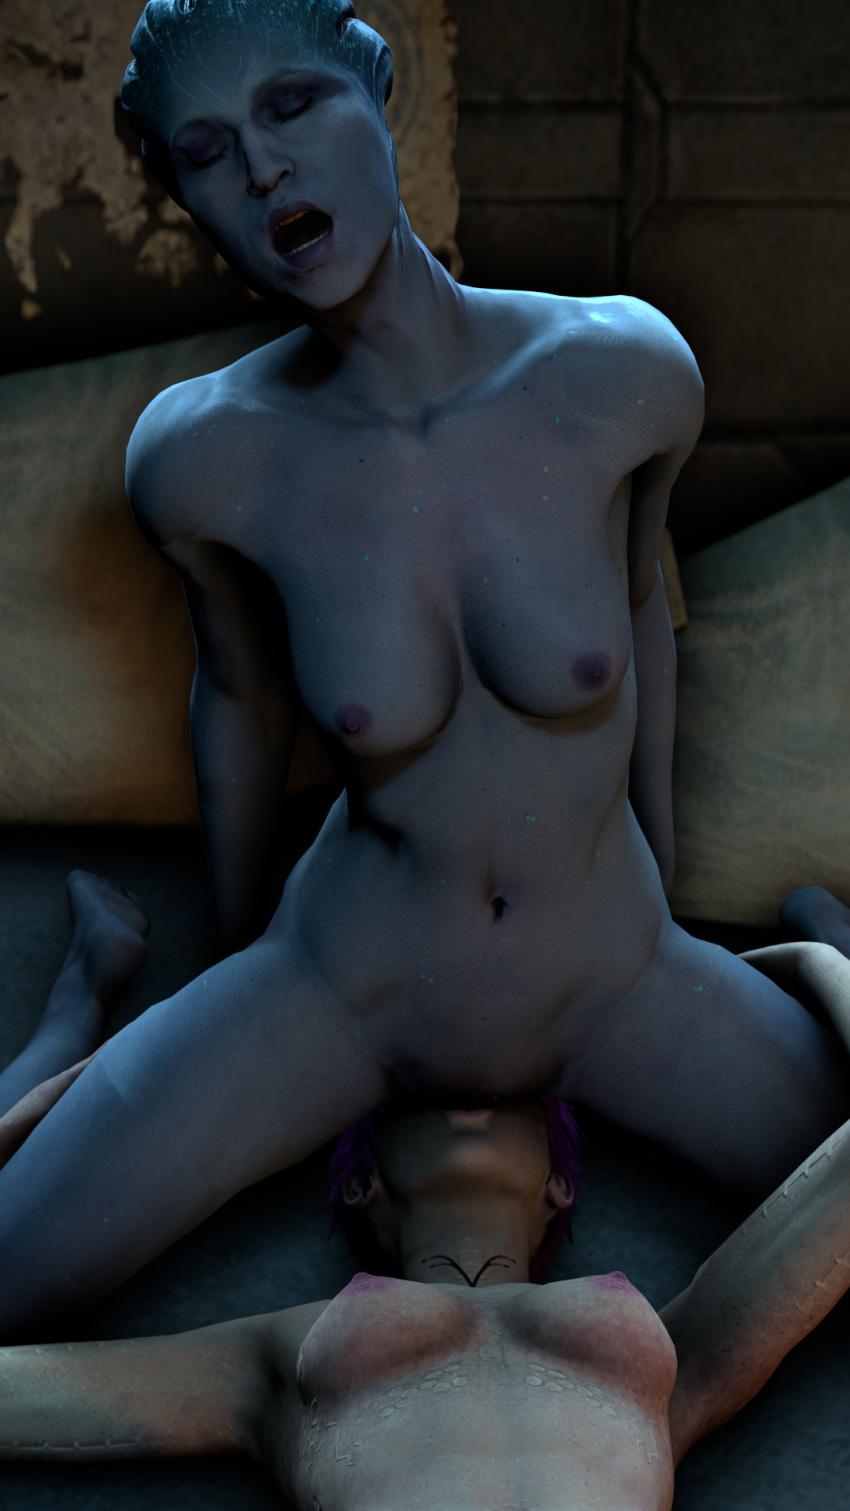 andromeda nude mass effect peebee How to train your dragon astrid nude